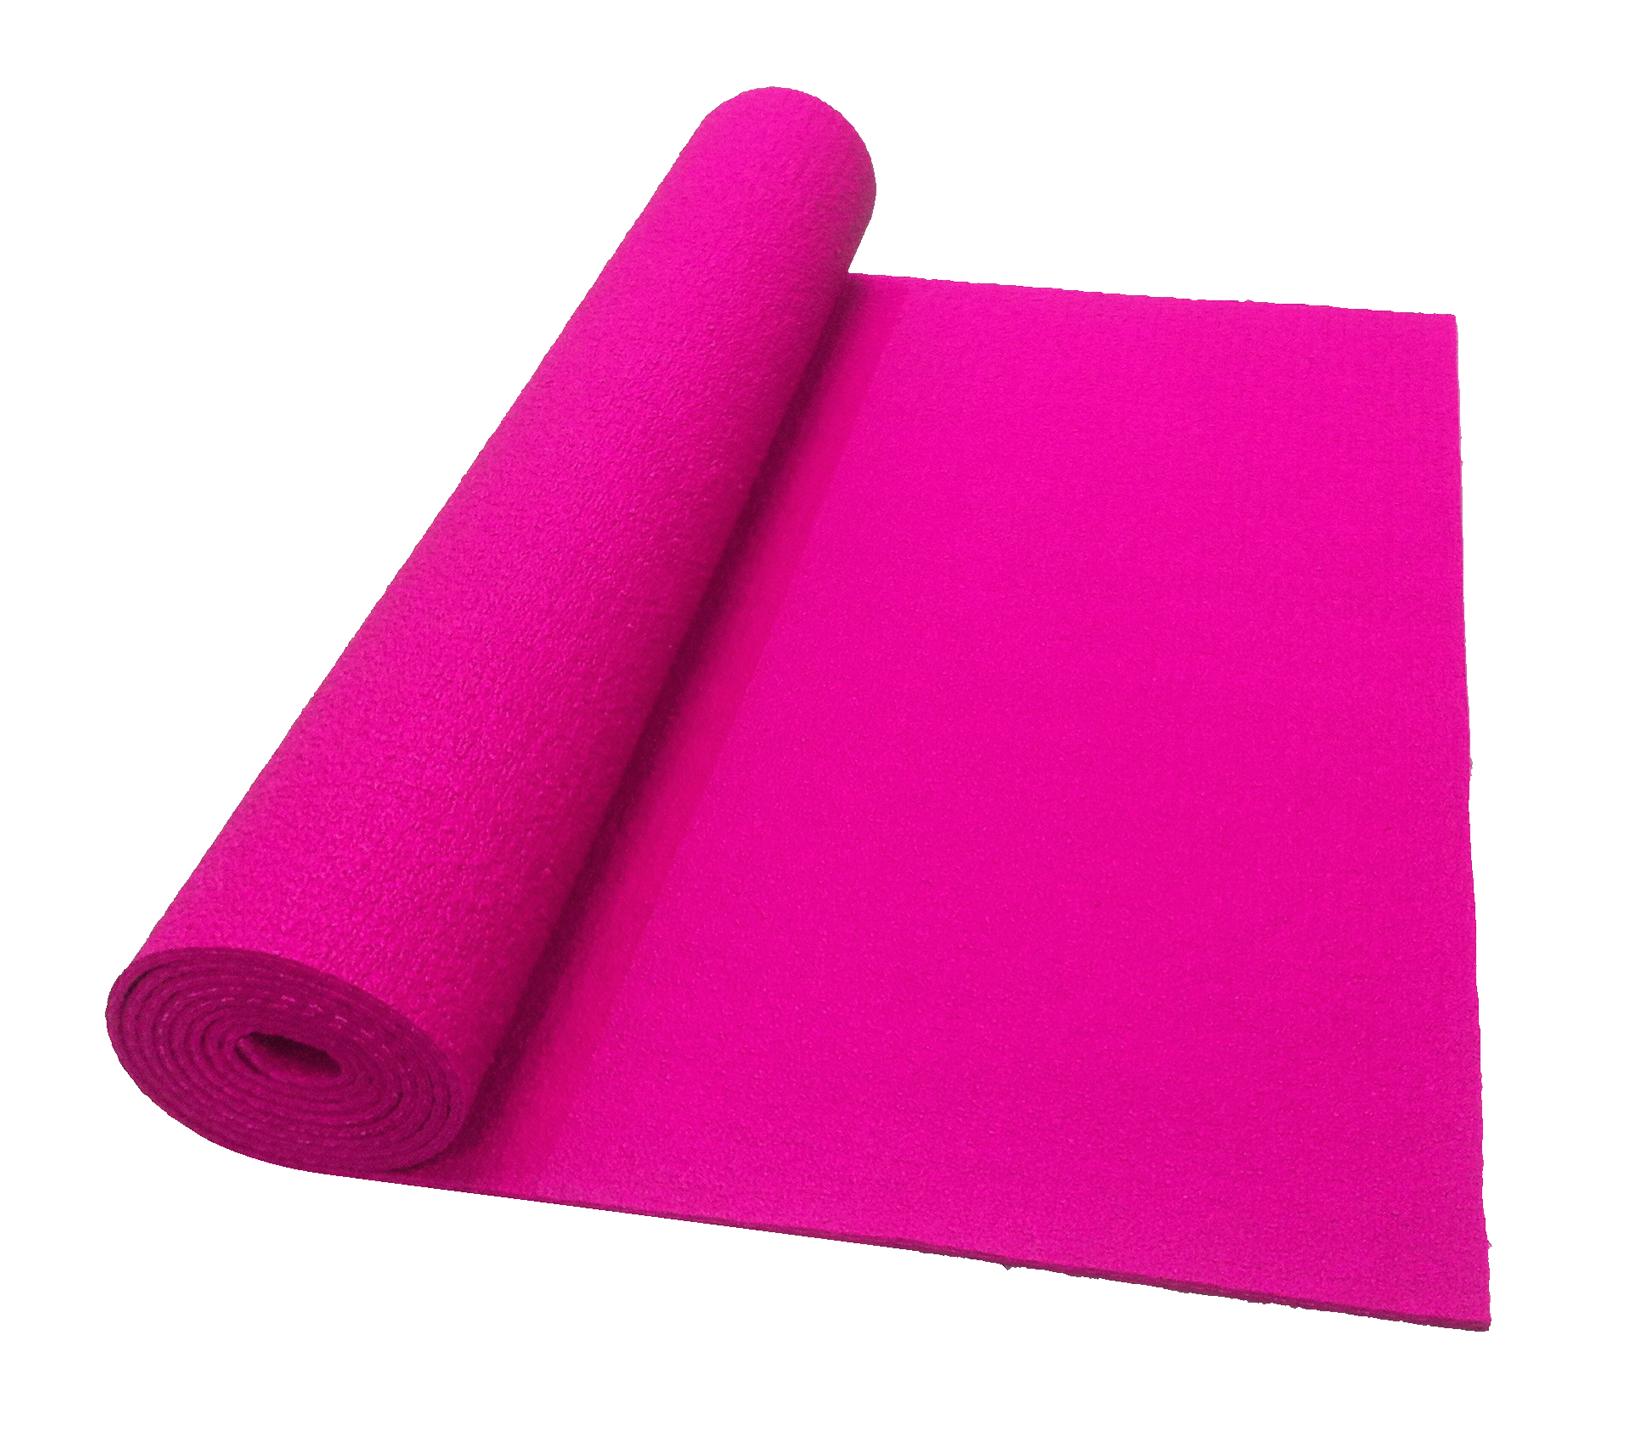 Yoga Mat Png Hdpng.com 1650 - Yoga Mat, Transparent background PNG HD thumbnail